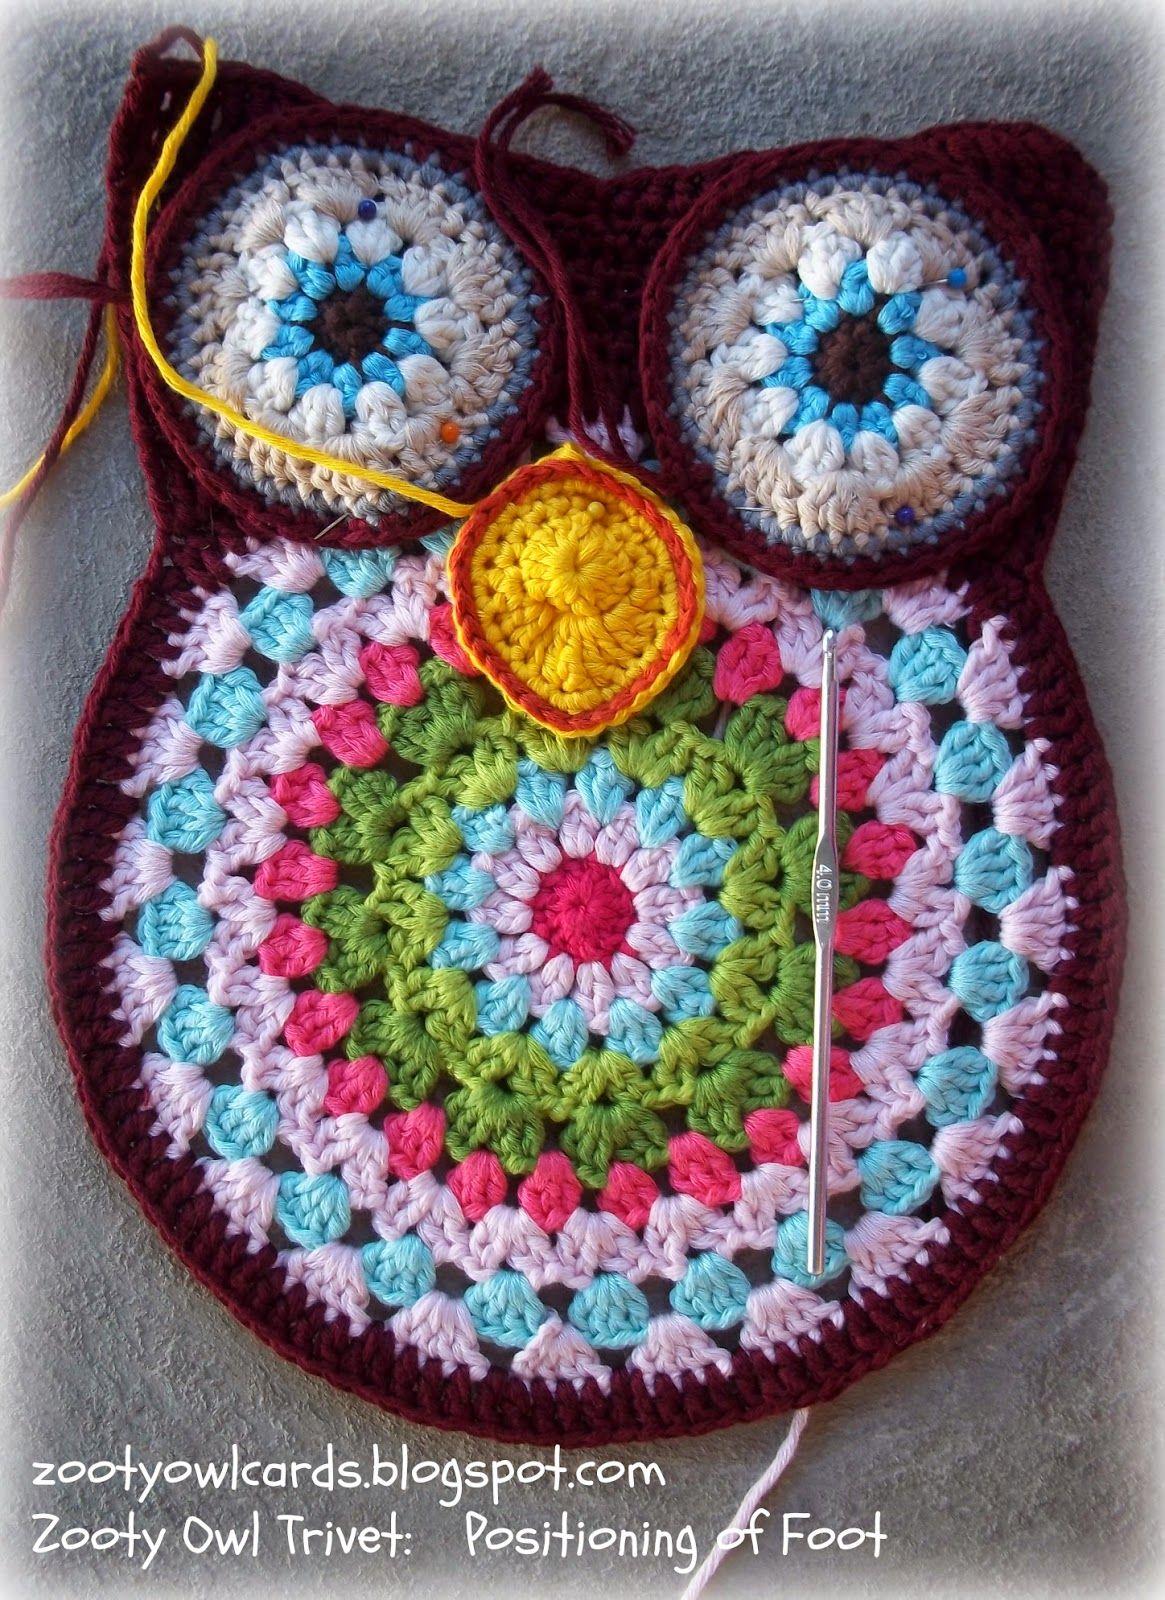 Crochet Trivets Free Pattern Crochet Owl Trivets Bringing Back Grandma Crochet Love